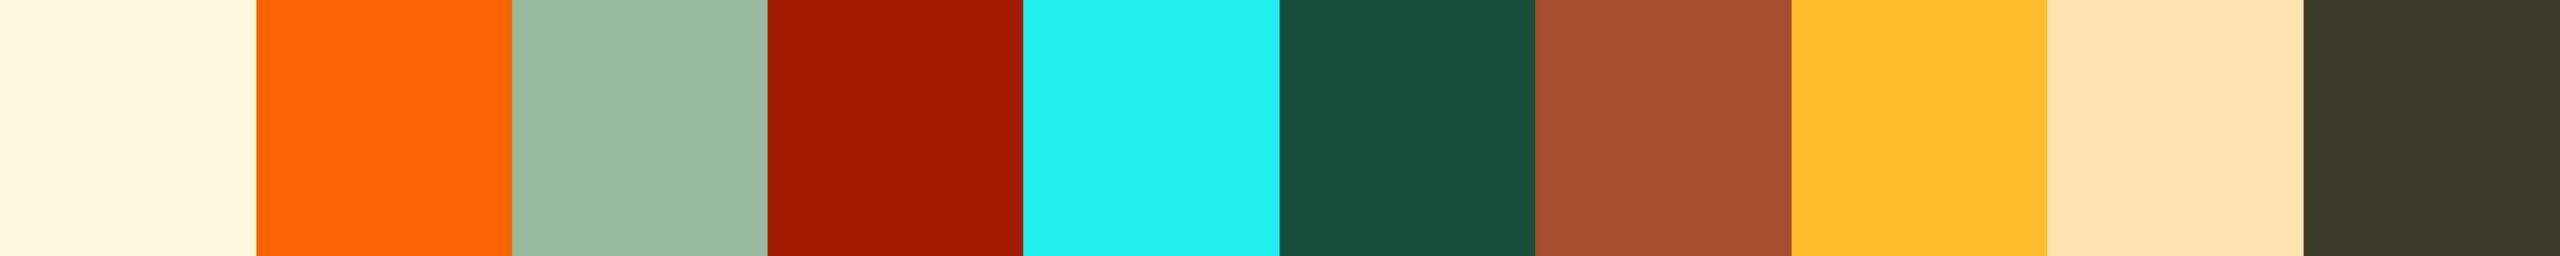 454 Roniasa Color Palette